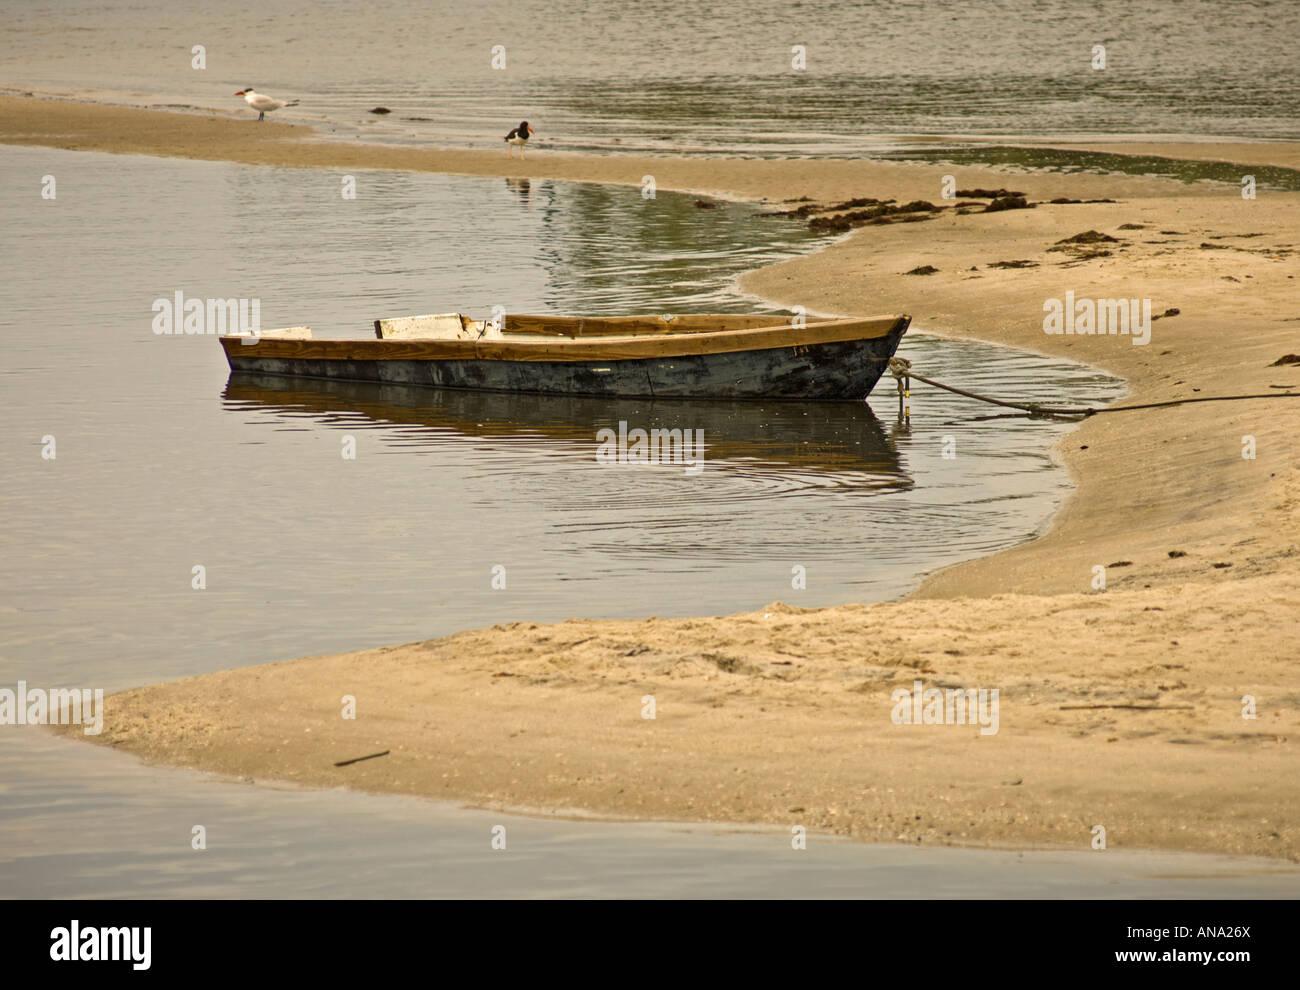 rowboat small boat abandoned sunk founder - Stock Image